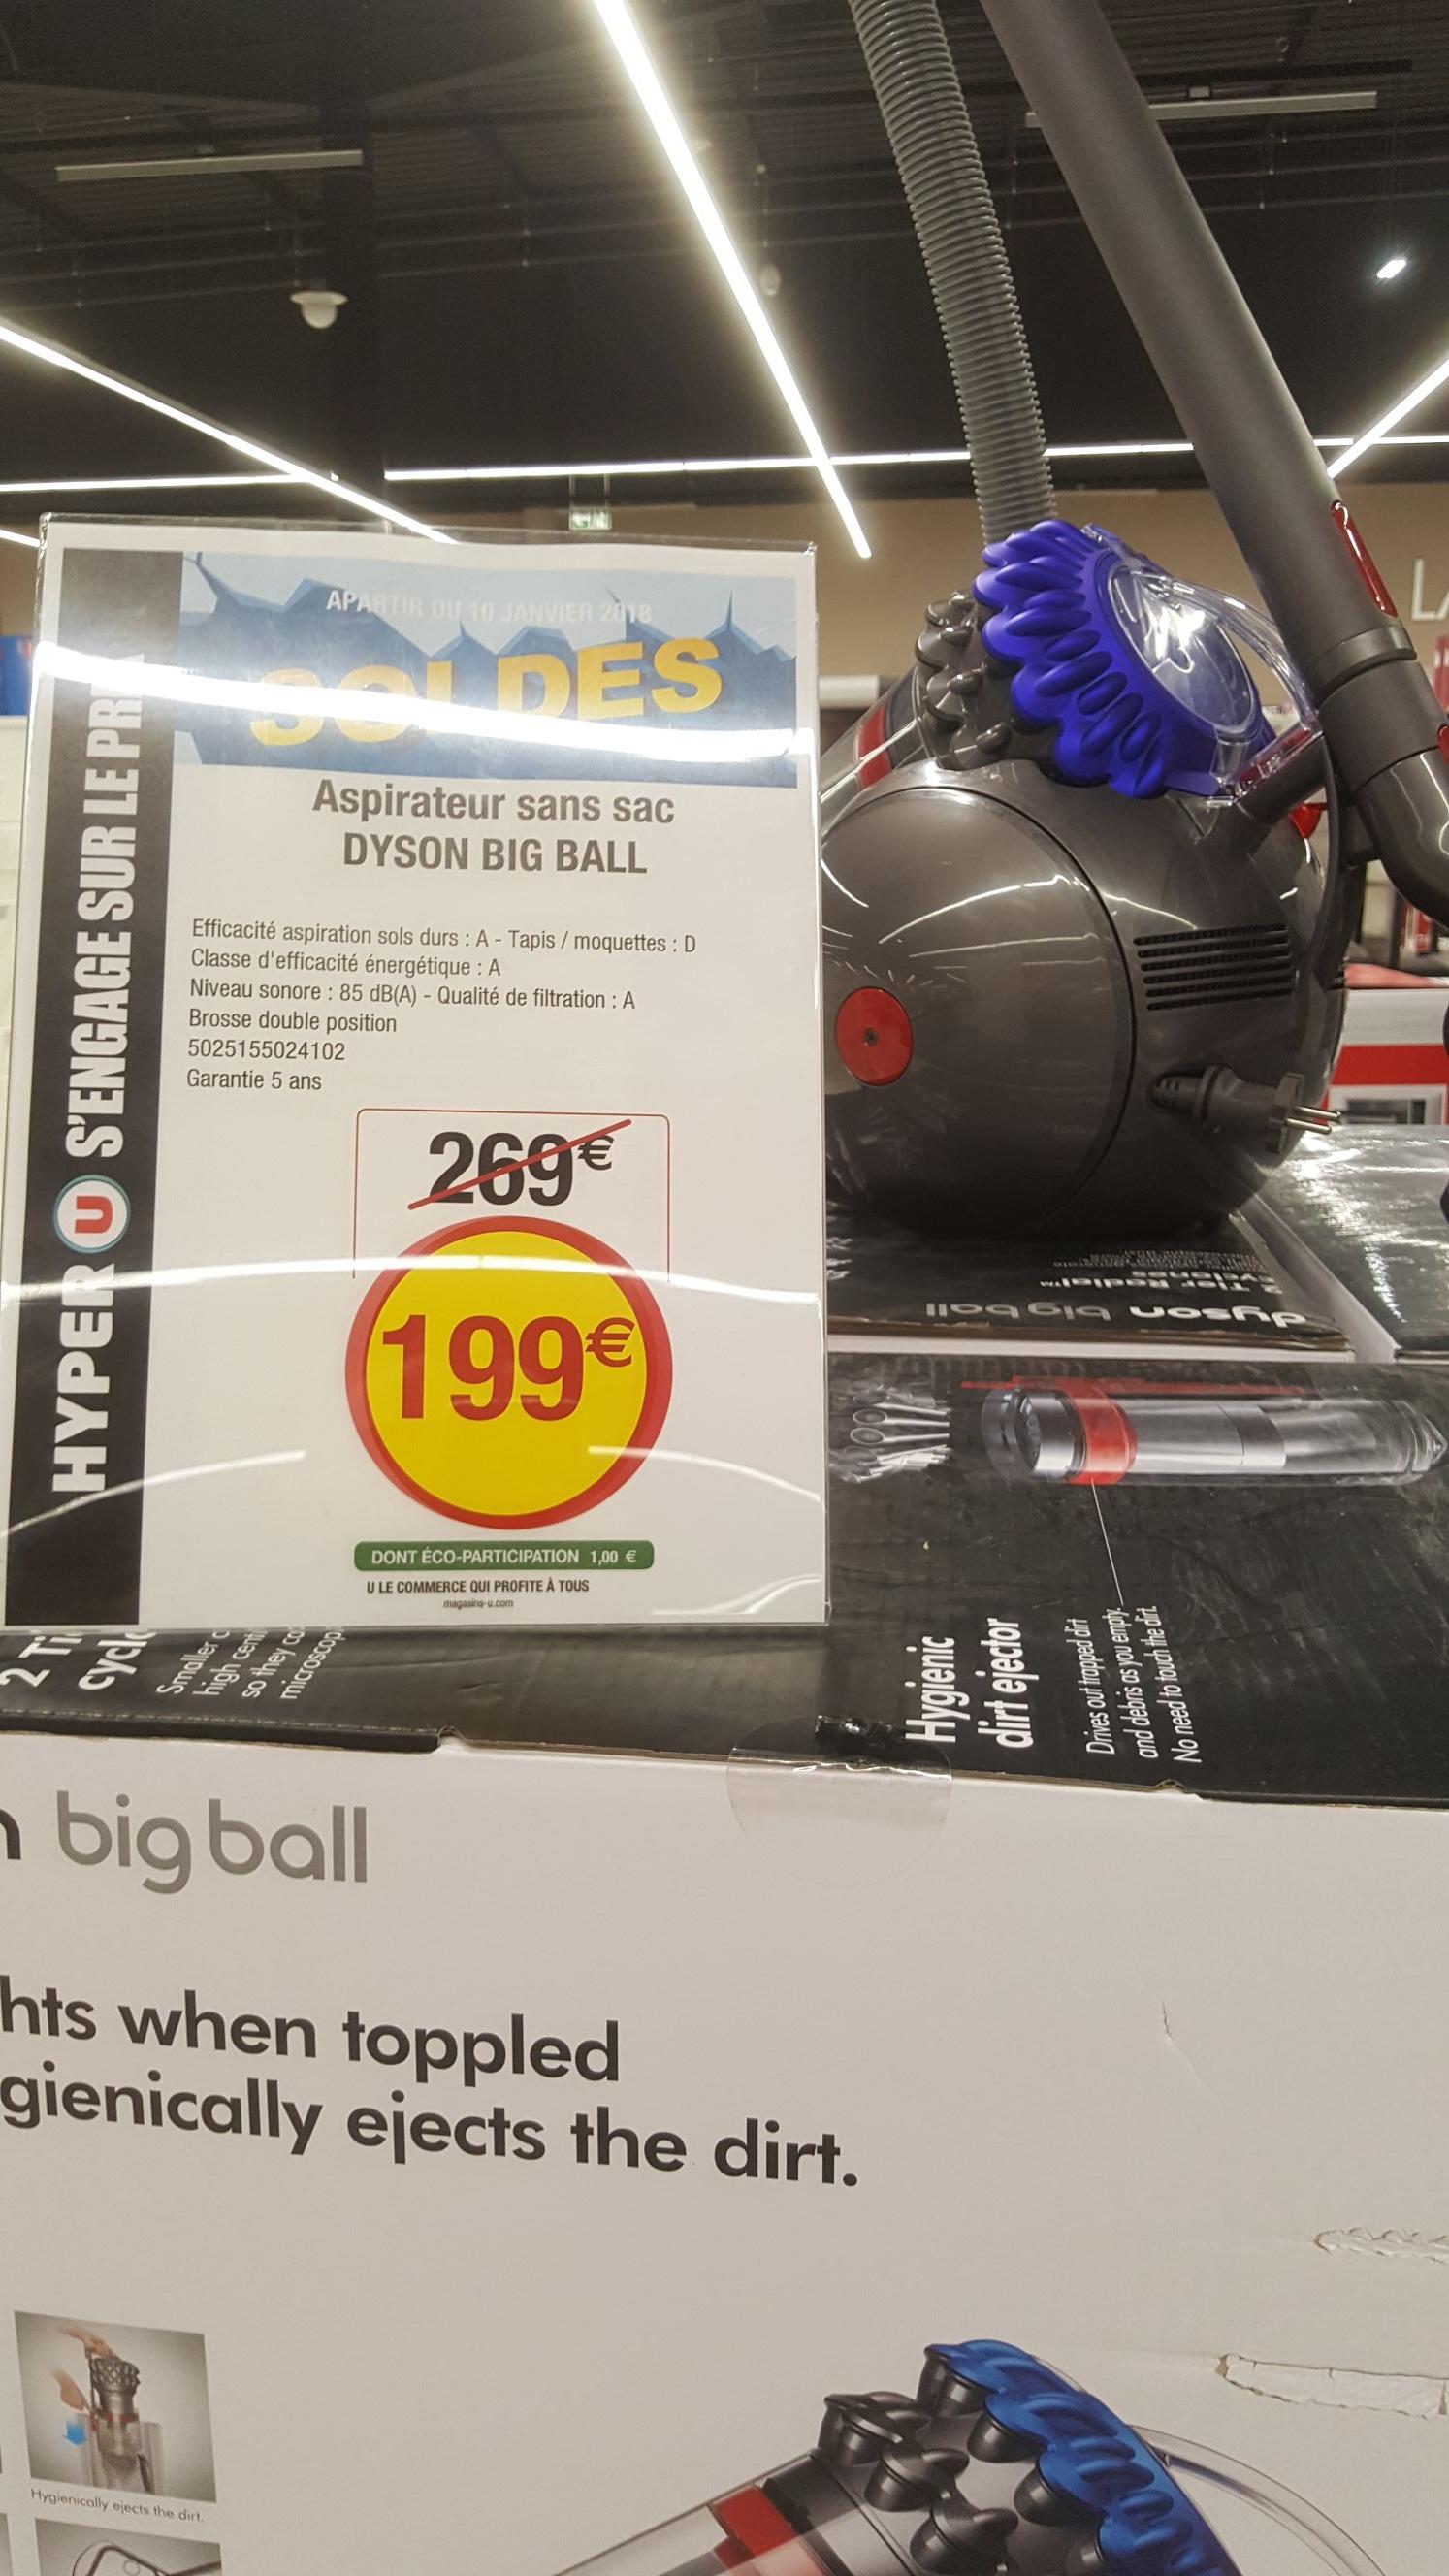 Aspirateur Dyson Big Ball - Hyper U Reims village (51)